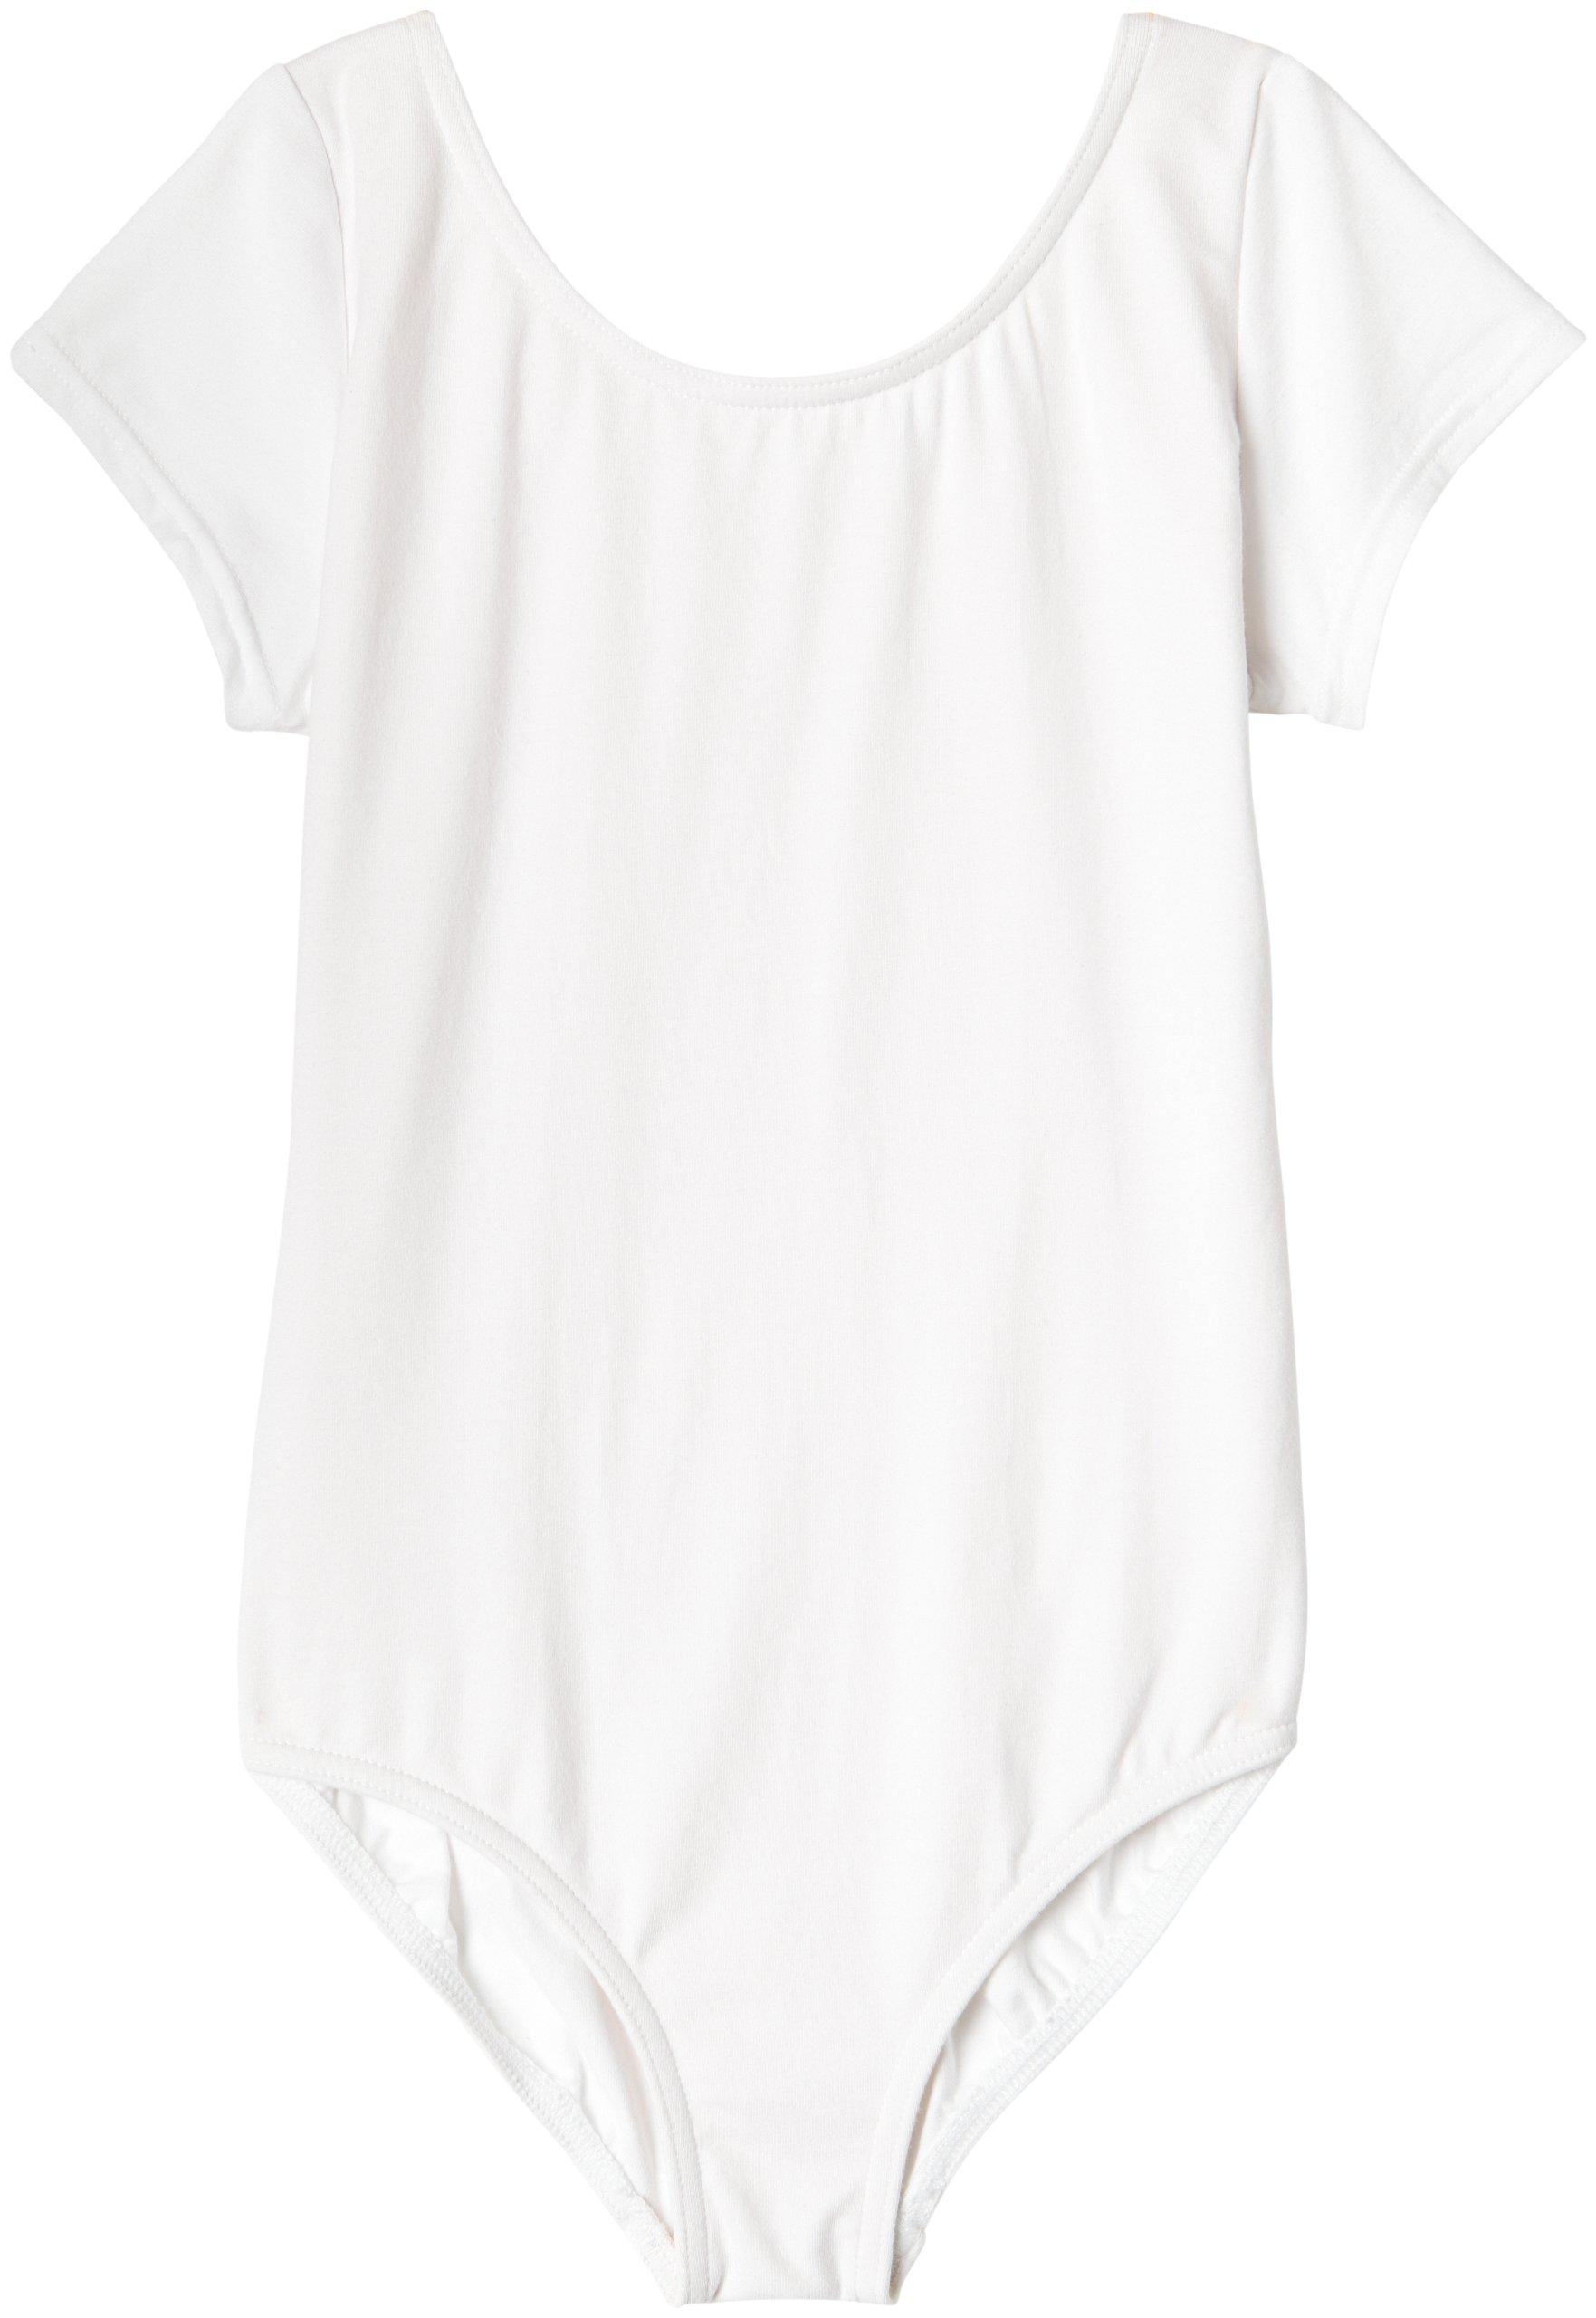 Capezio Big Girls' Classic Short Sleeve Leotard,White,M (8-10)